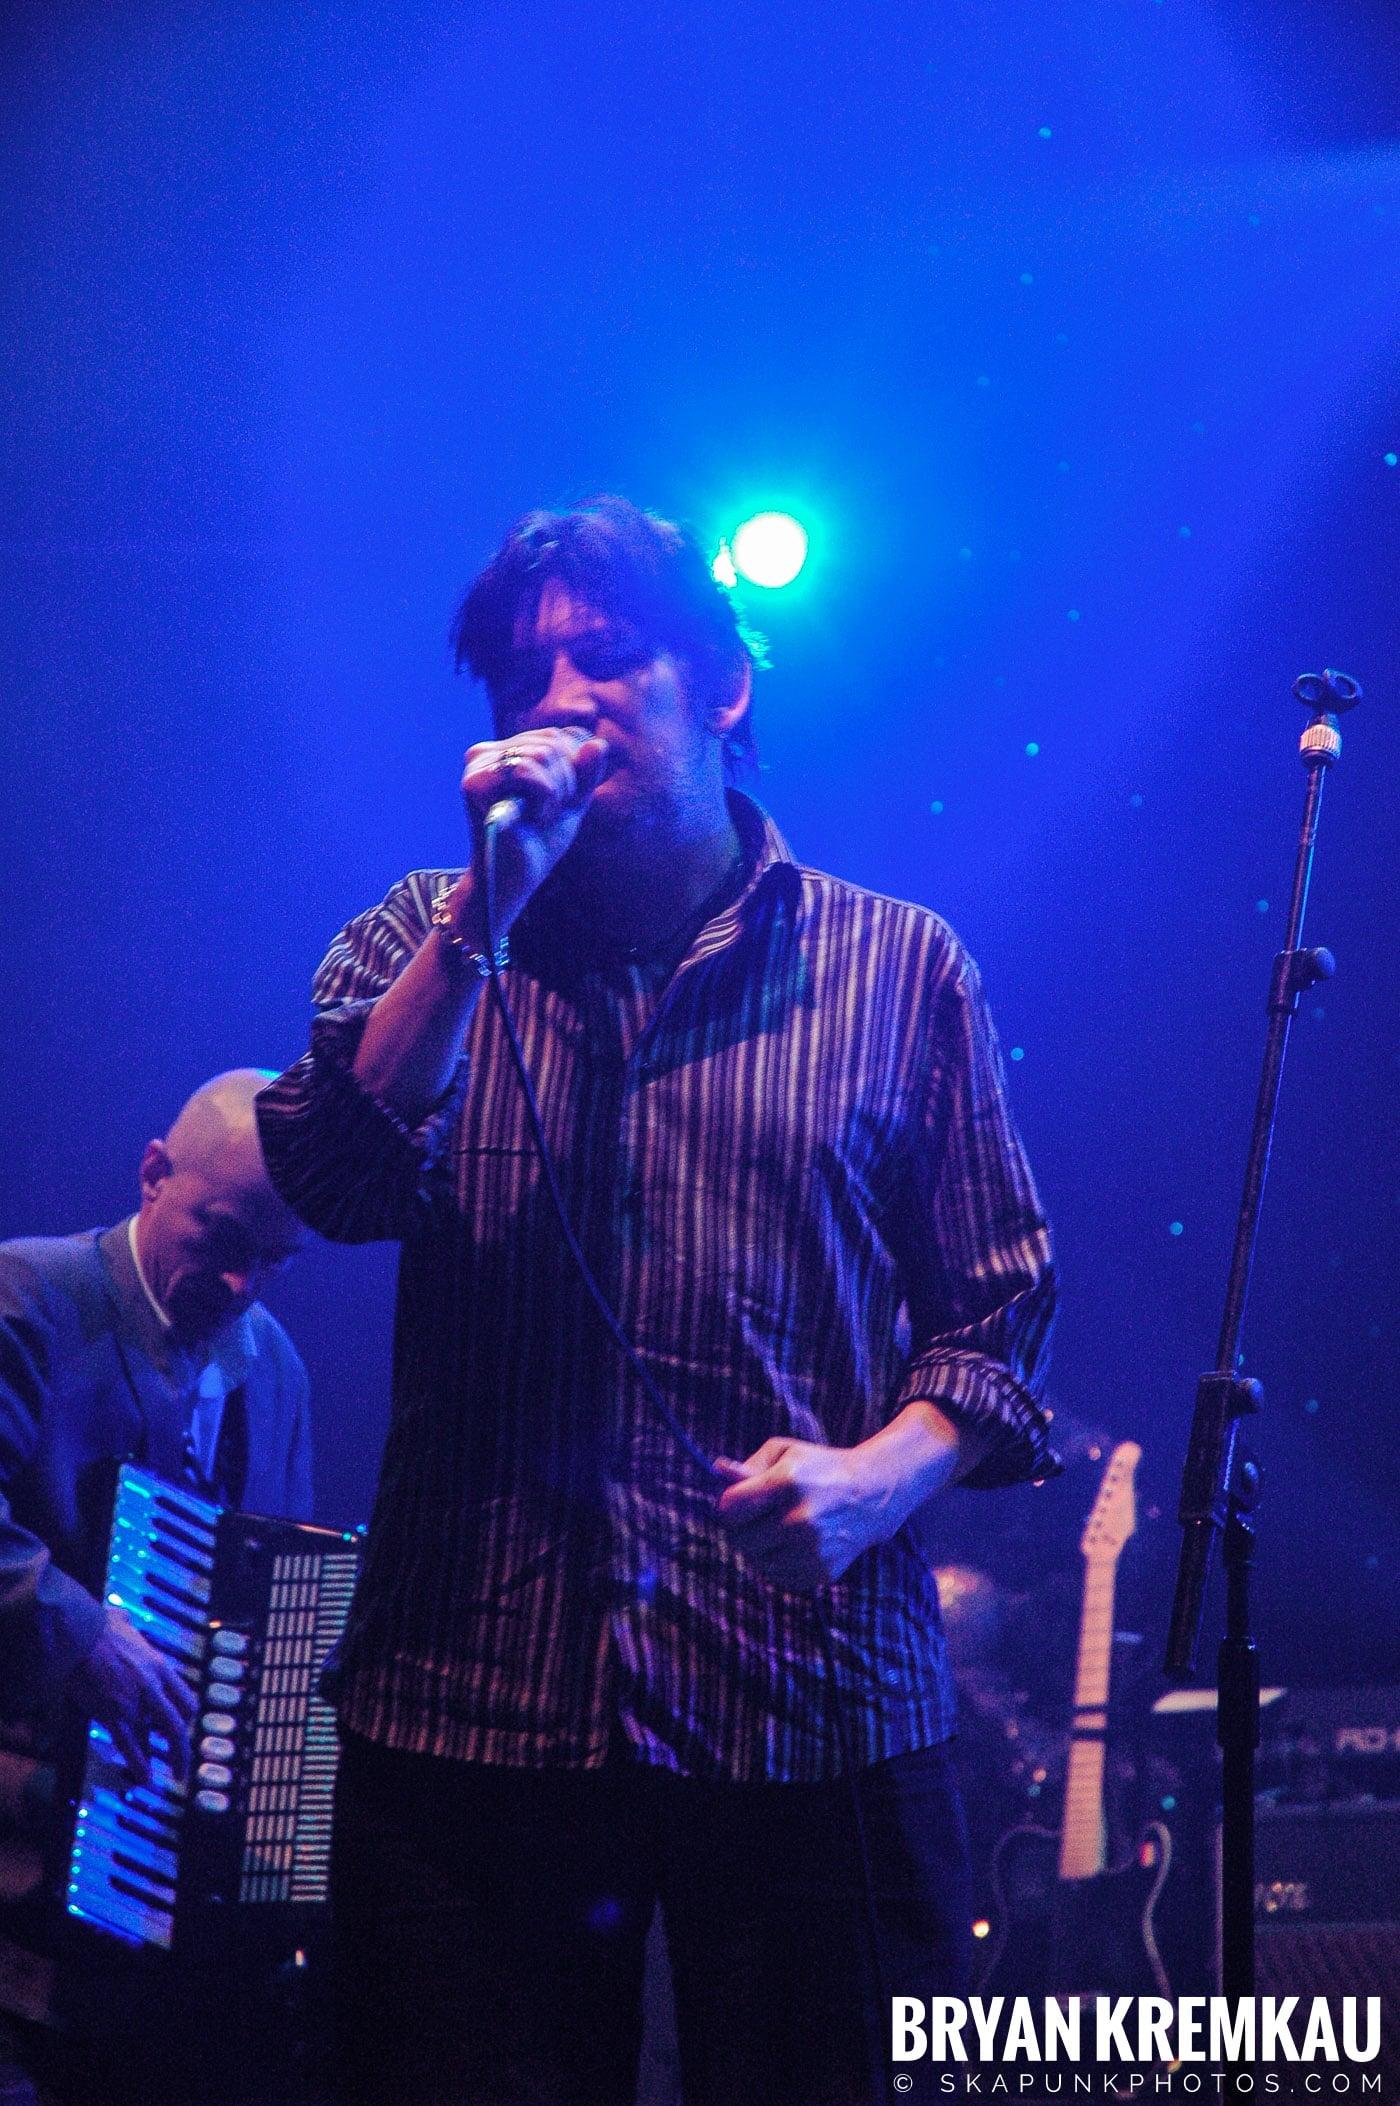 The Pogues @ Brixton Academy, London UK - 12.19.05 (27)